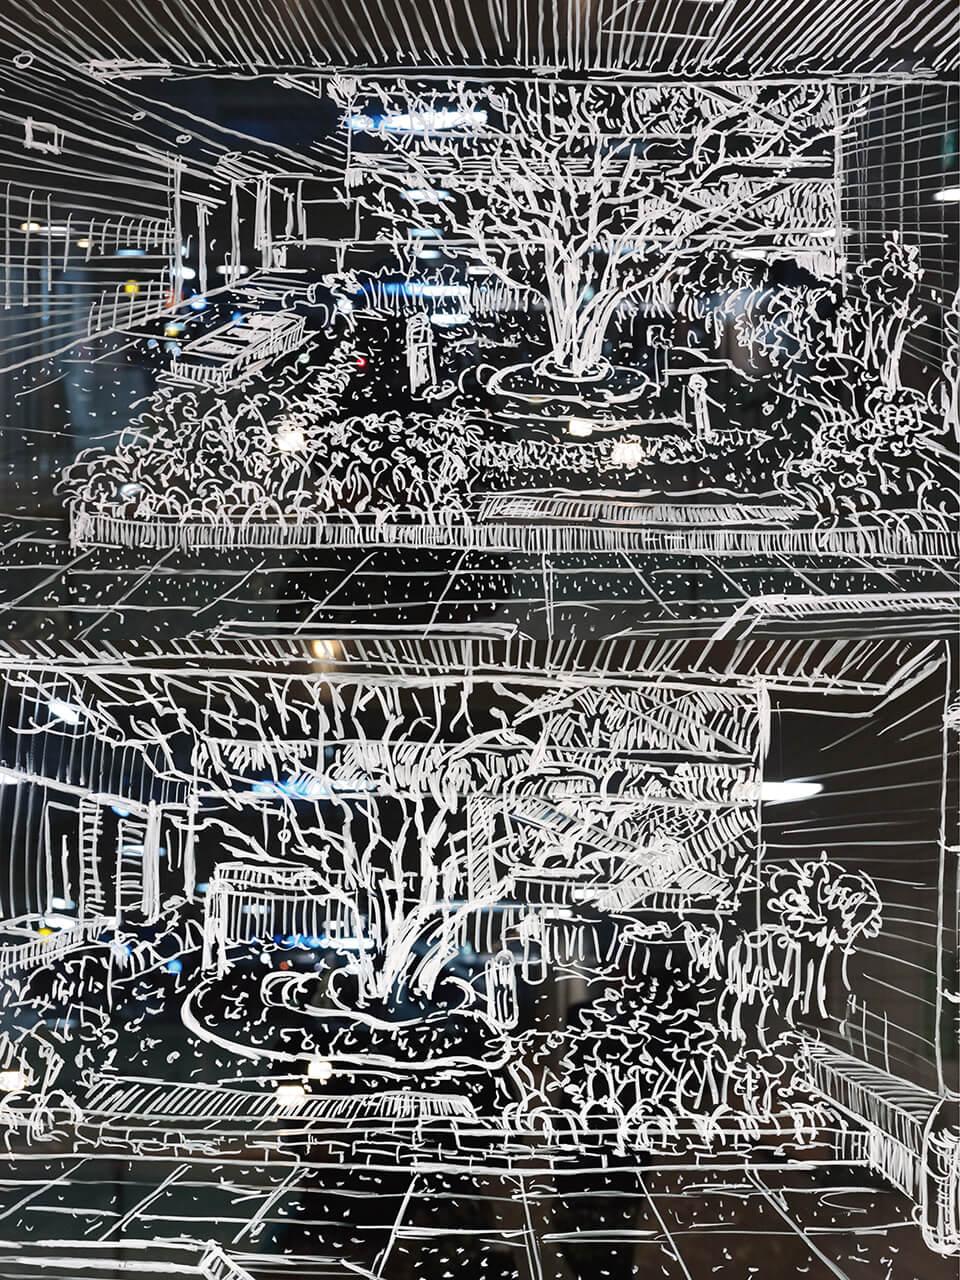 「BEYOND~コチラとムコウ in 茨木~ 」<br /> 2014<br /> 2階通用口 210×600cm detail<br /> 施設内の4カ所、計20数枚の窓ガラスに直接ドローイング<br /> lacquer marker direct on window<br /> 茨木市立生涯学習センターきらめき/大阪